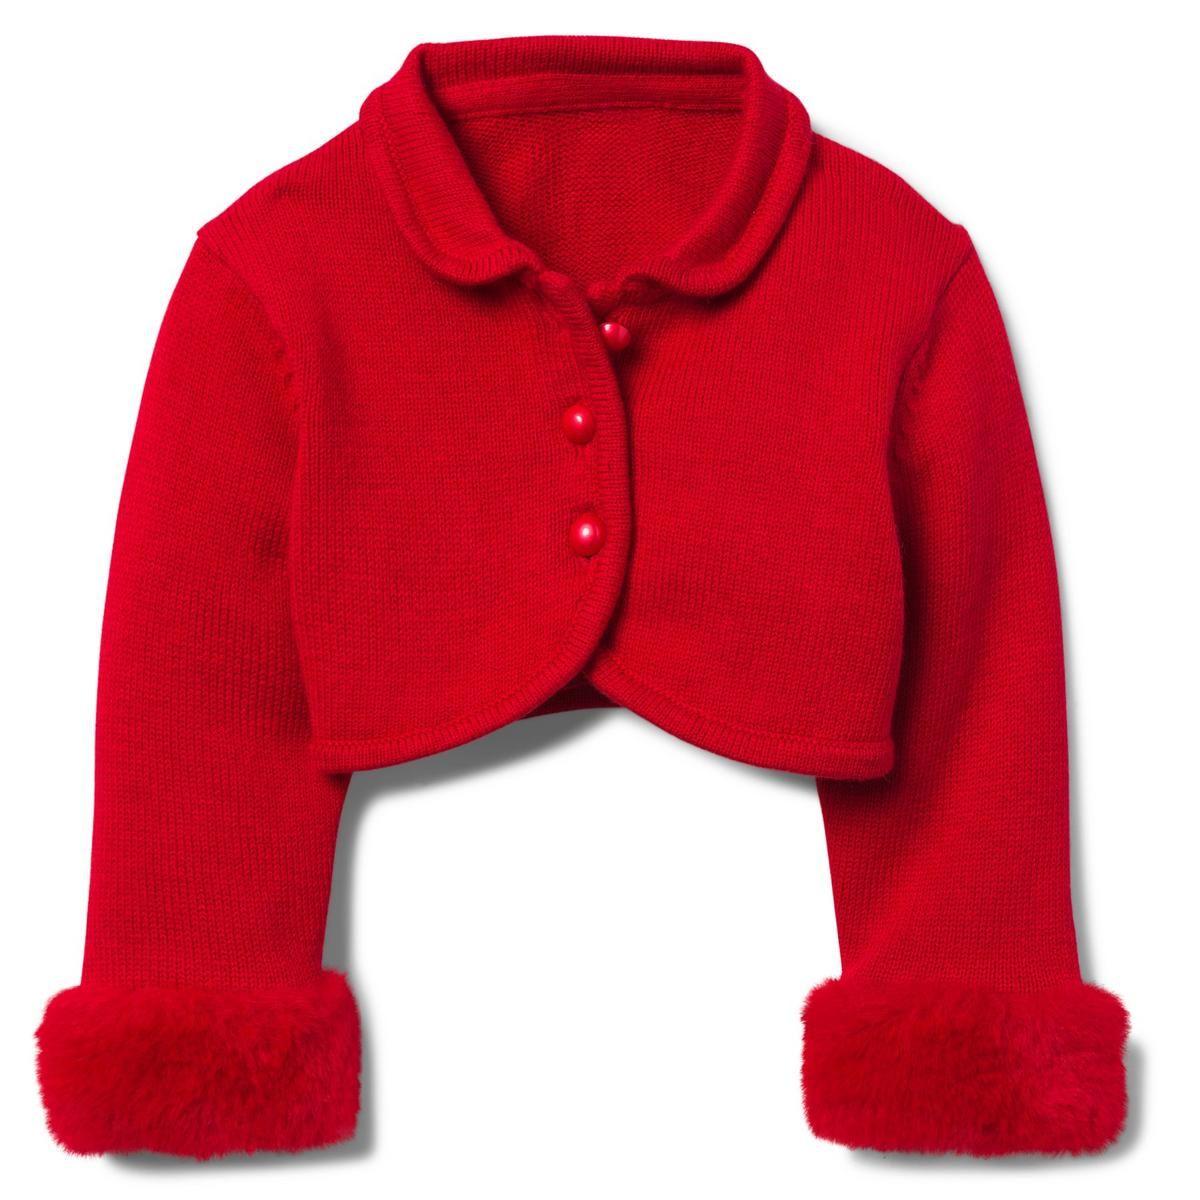 Jack And Janie Fur Cuff Sweater: Cropped Cardigan, Faux Fur, Fur